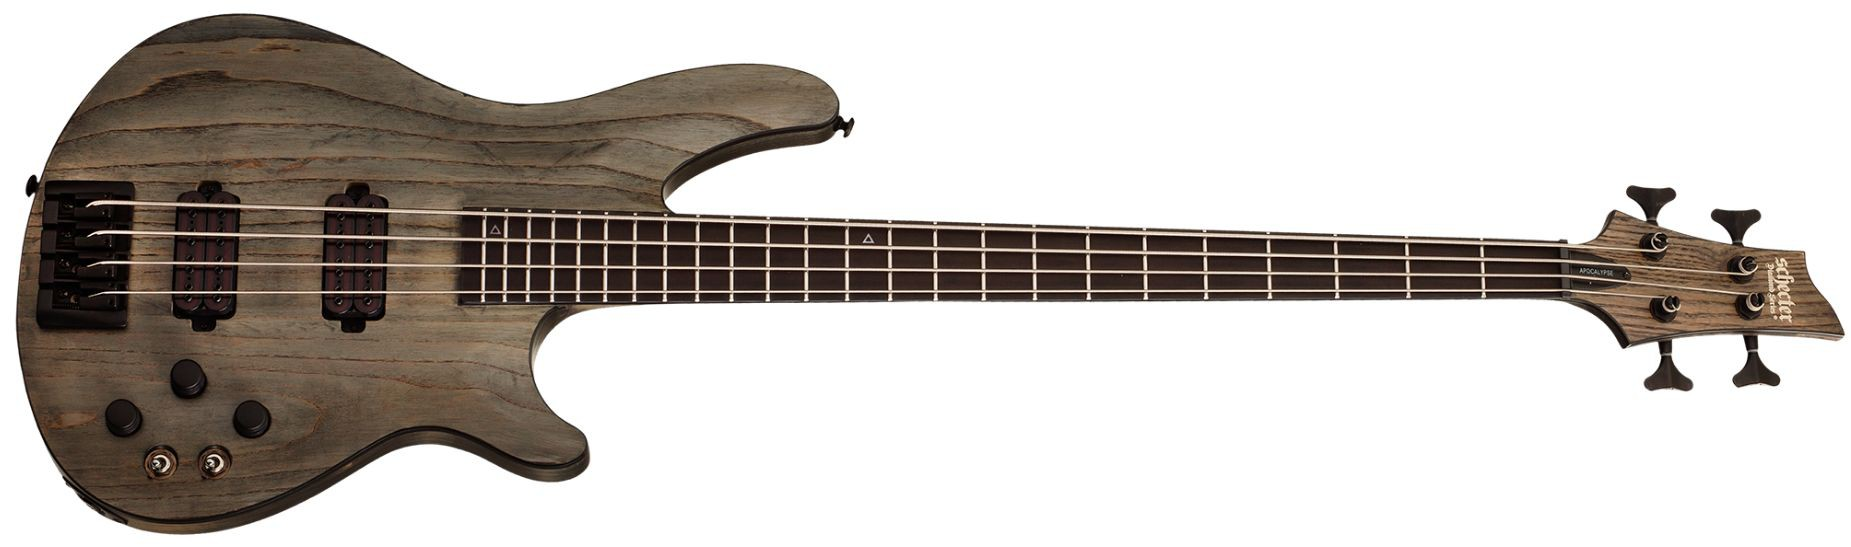 Schecter C4 Apocalypse EX Bass